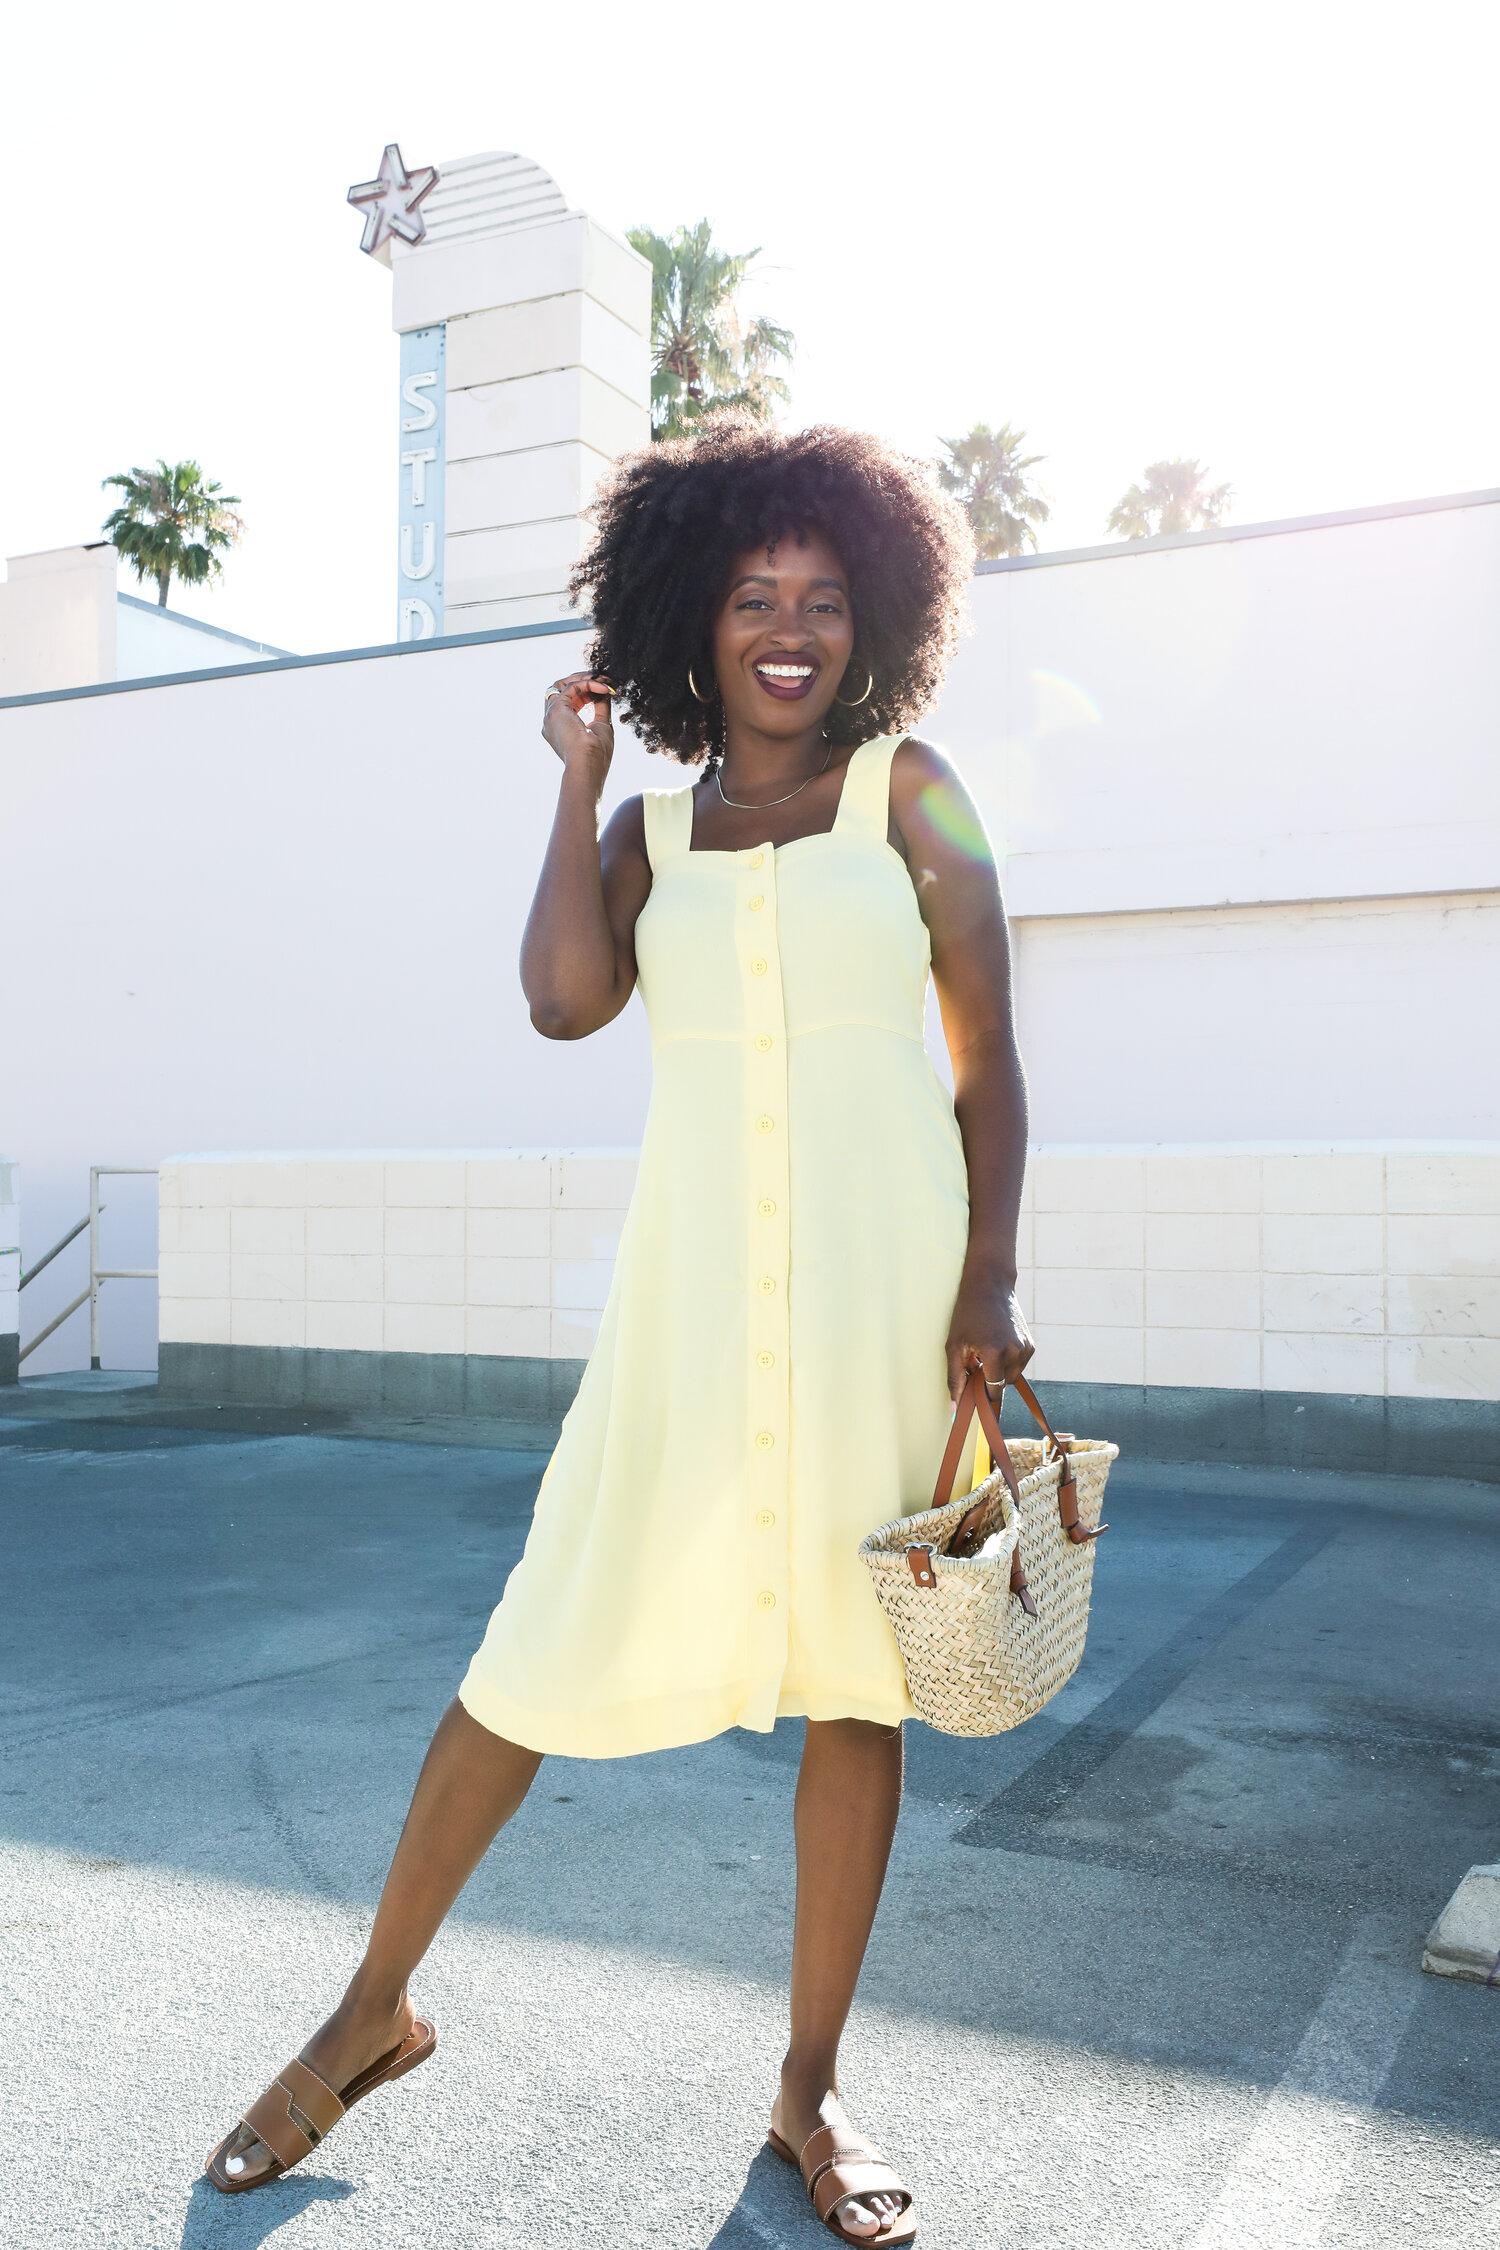 5 Black LA Social Media Influencers to Follow featured by top LA blogger, Alicia Tenise